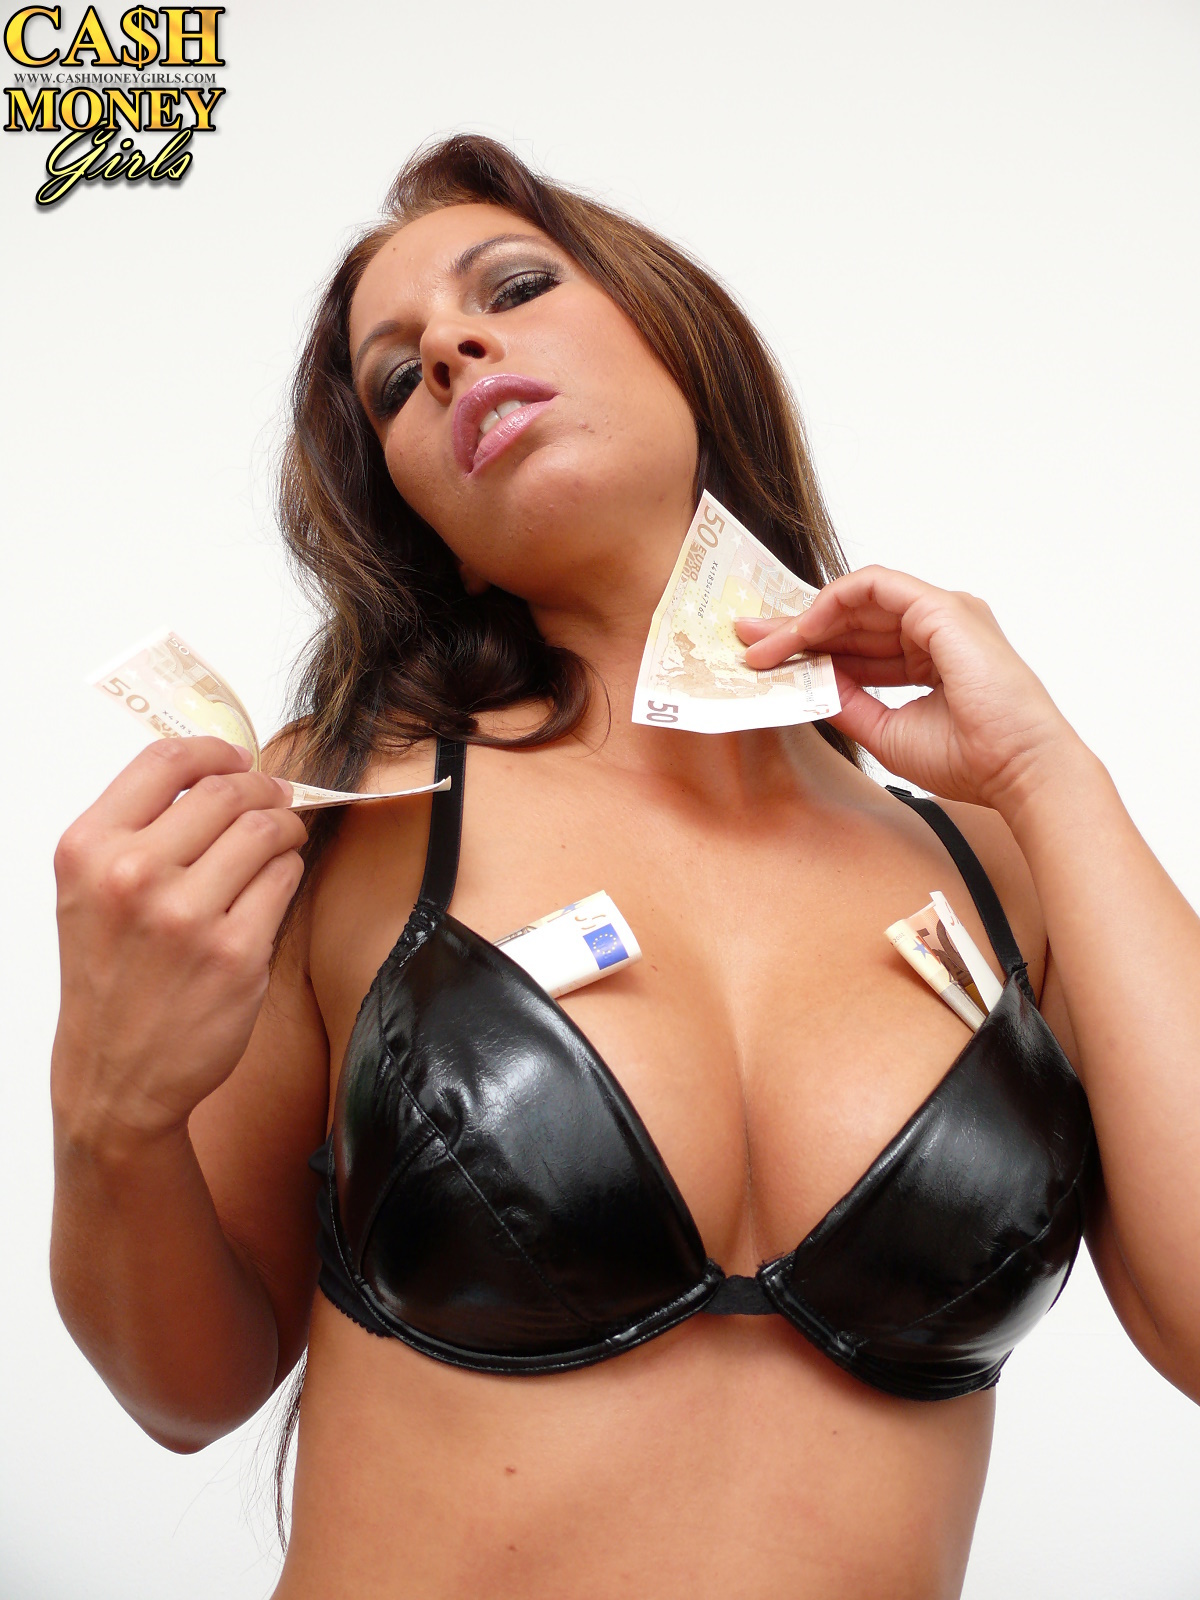 geld lady